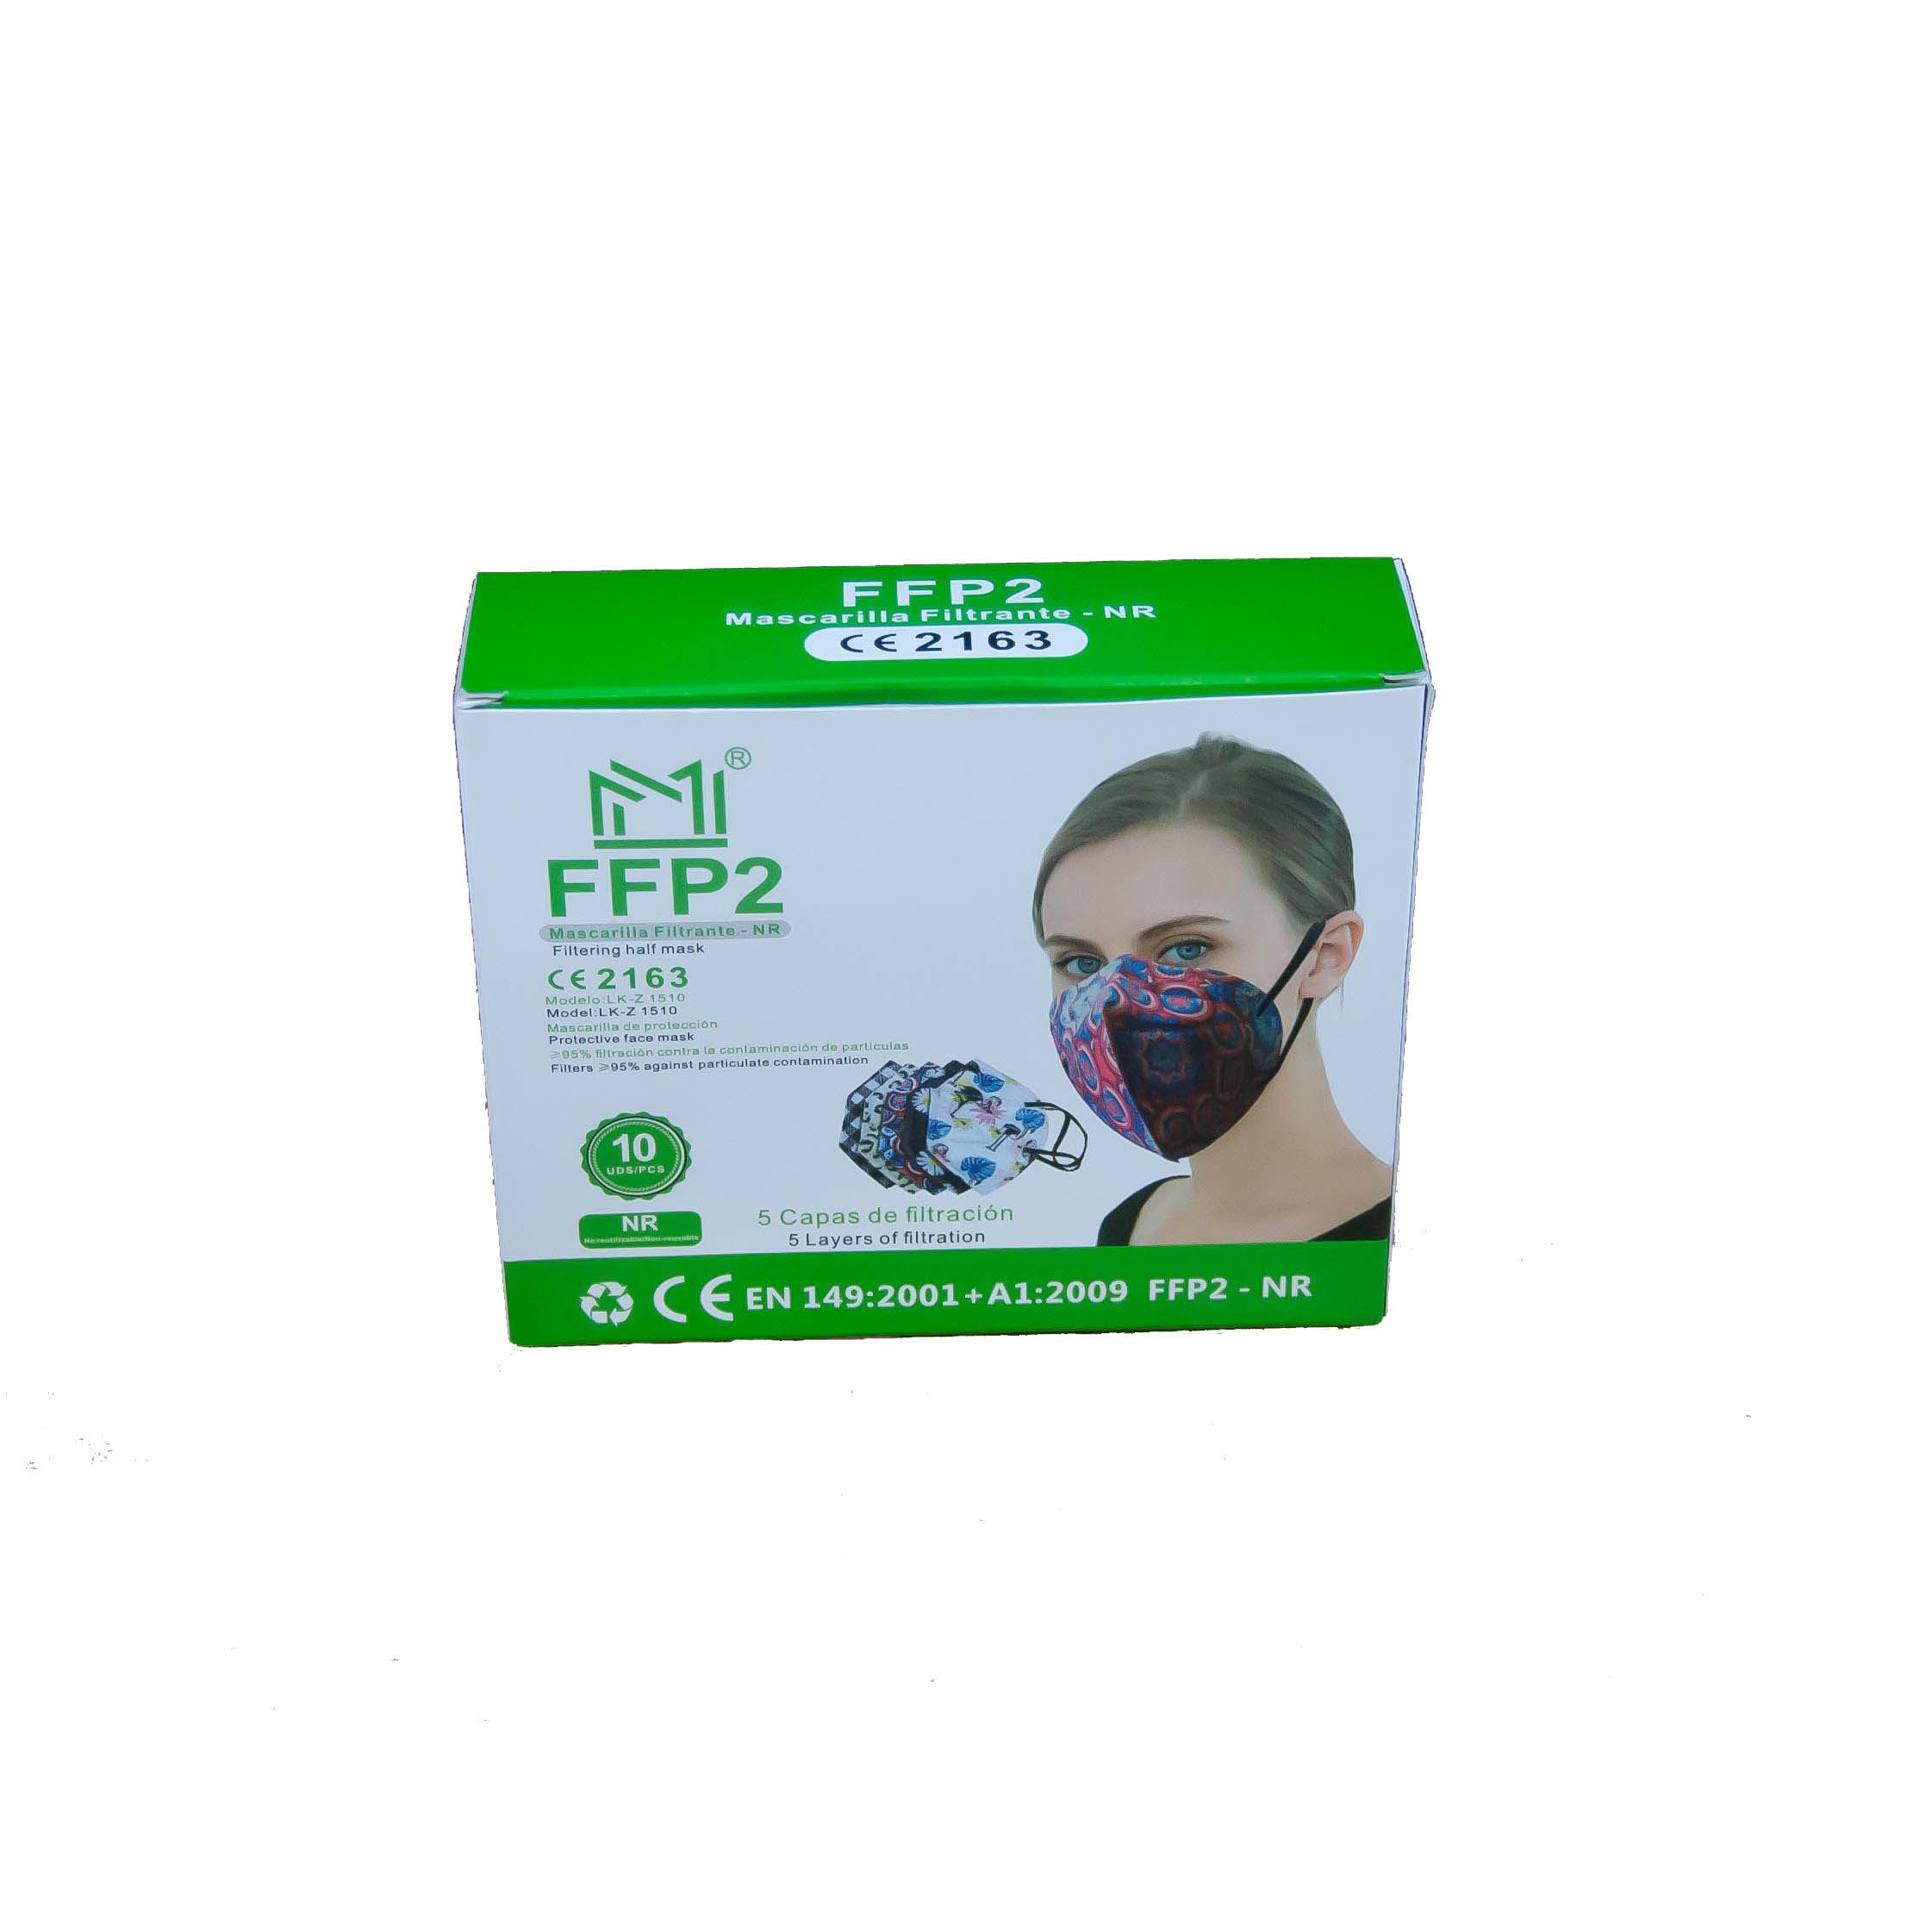 FFP2 resprirator